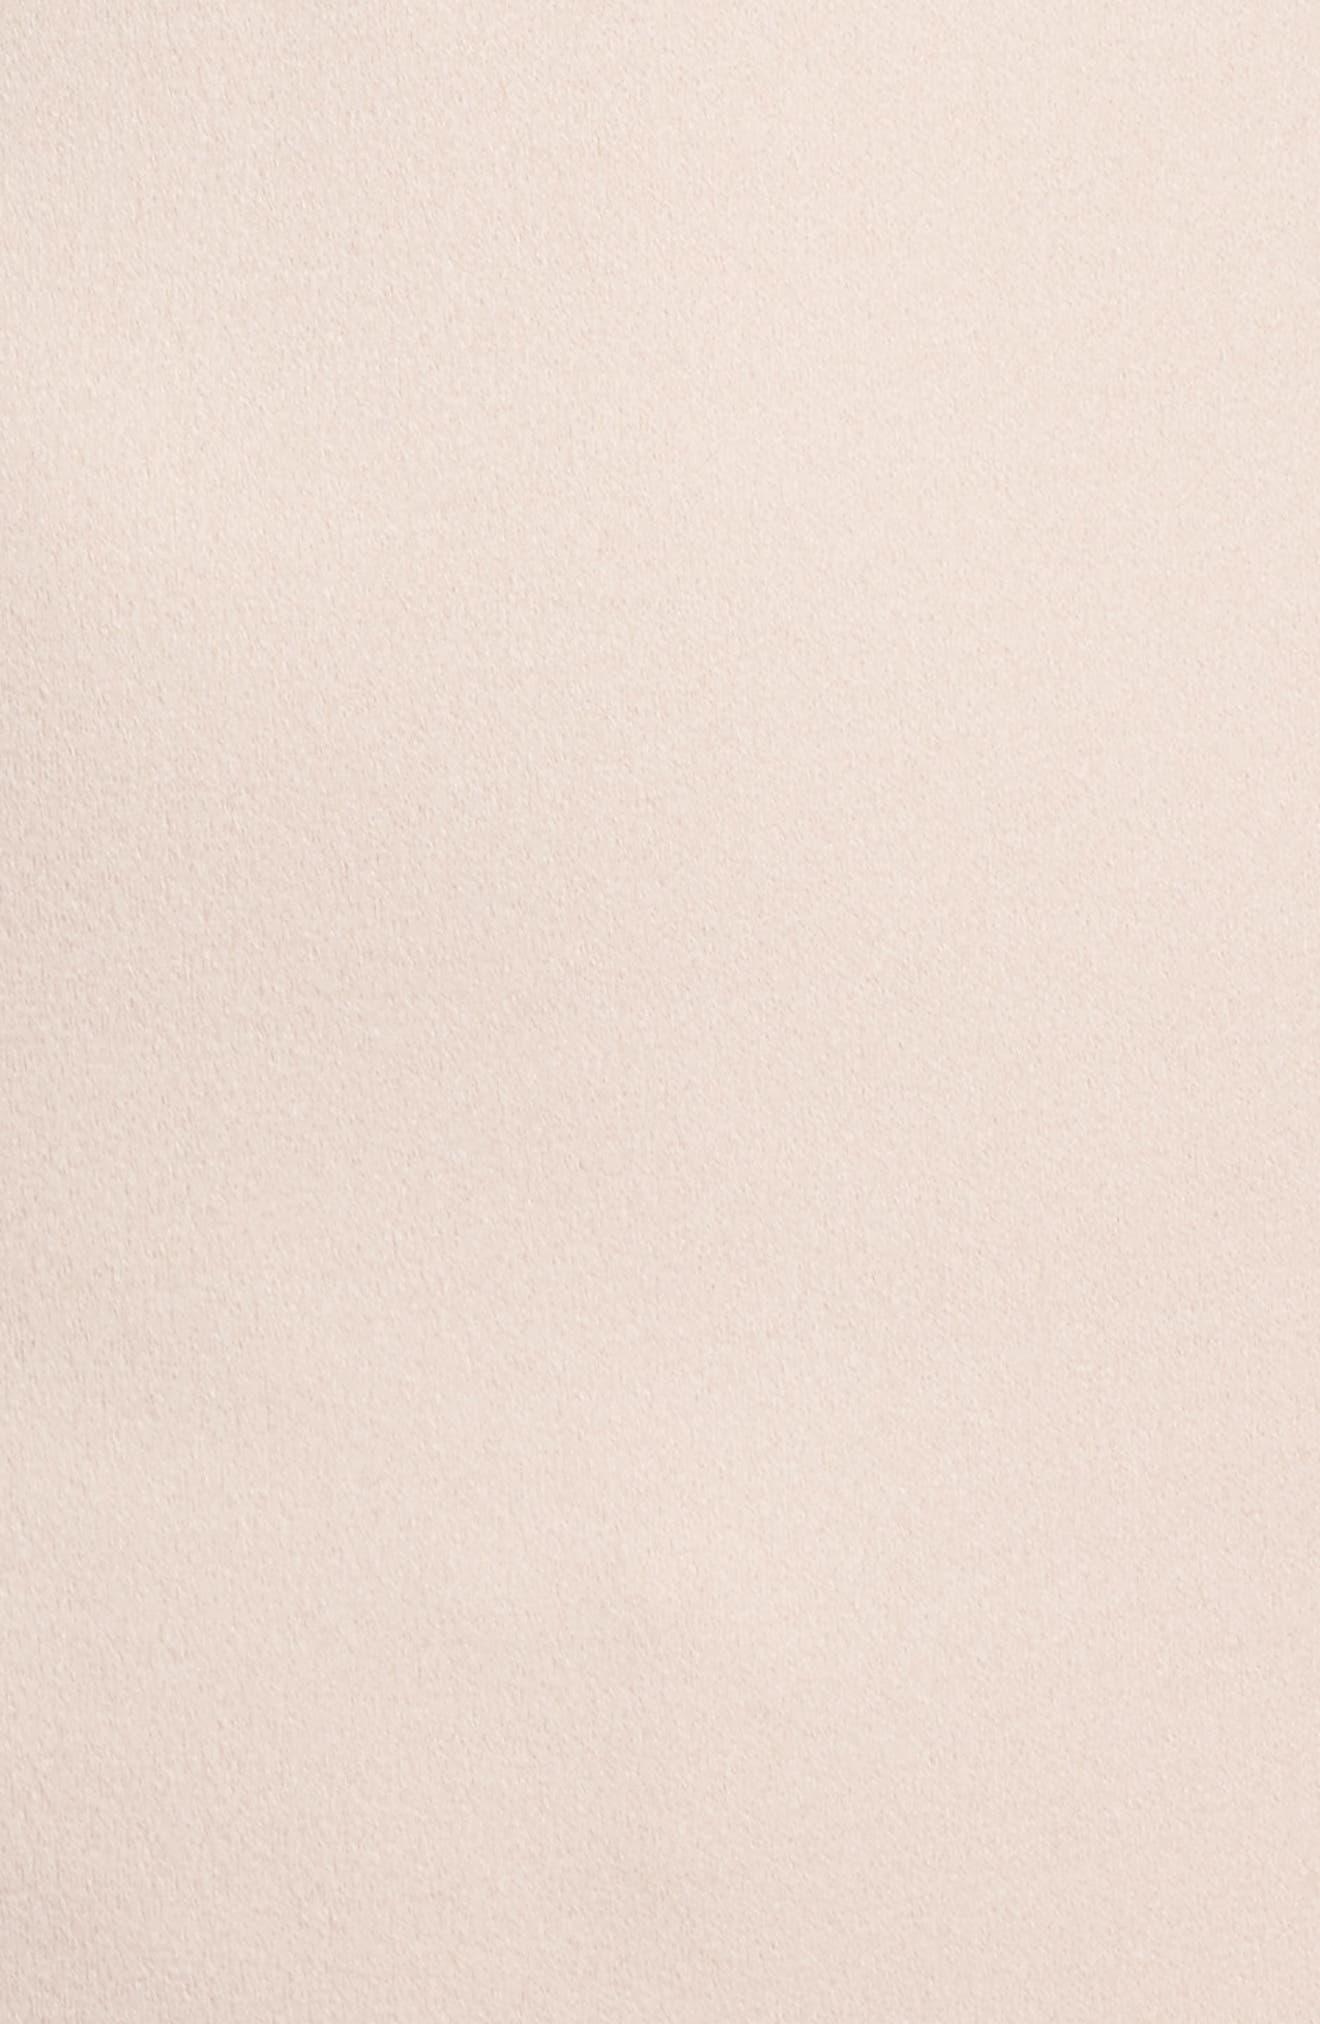 Embellished Crepe Popover Gown,                             Alternate thumbnail 5, color,                             Light Blush